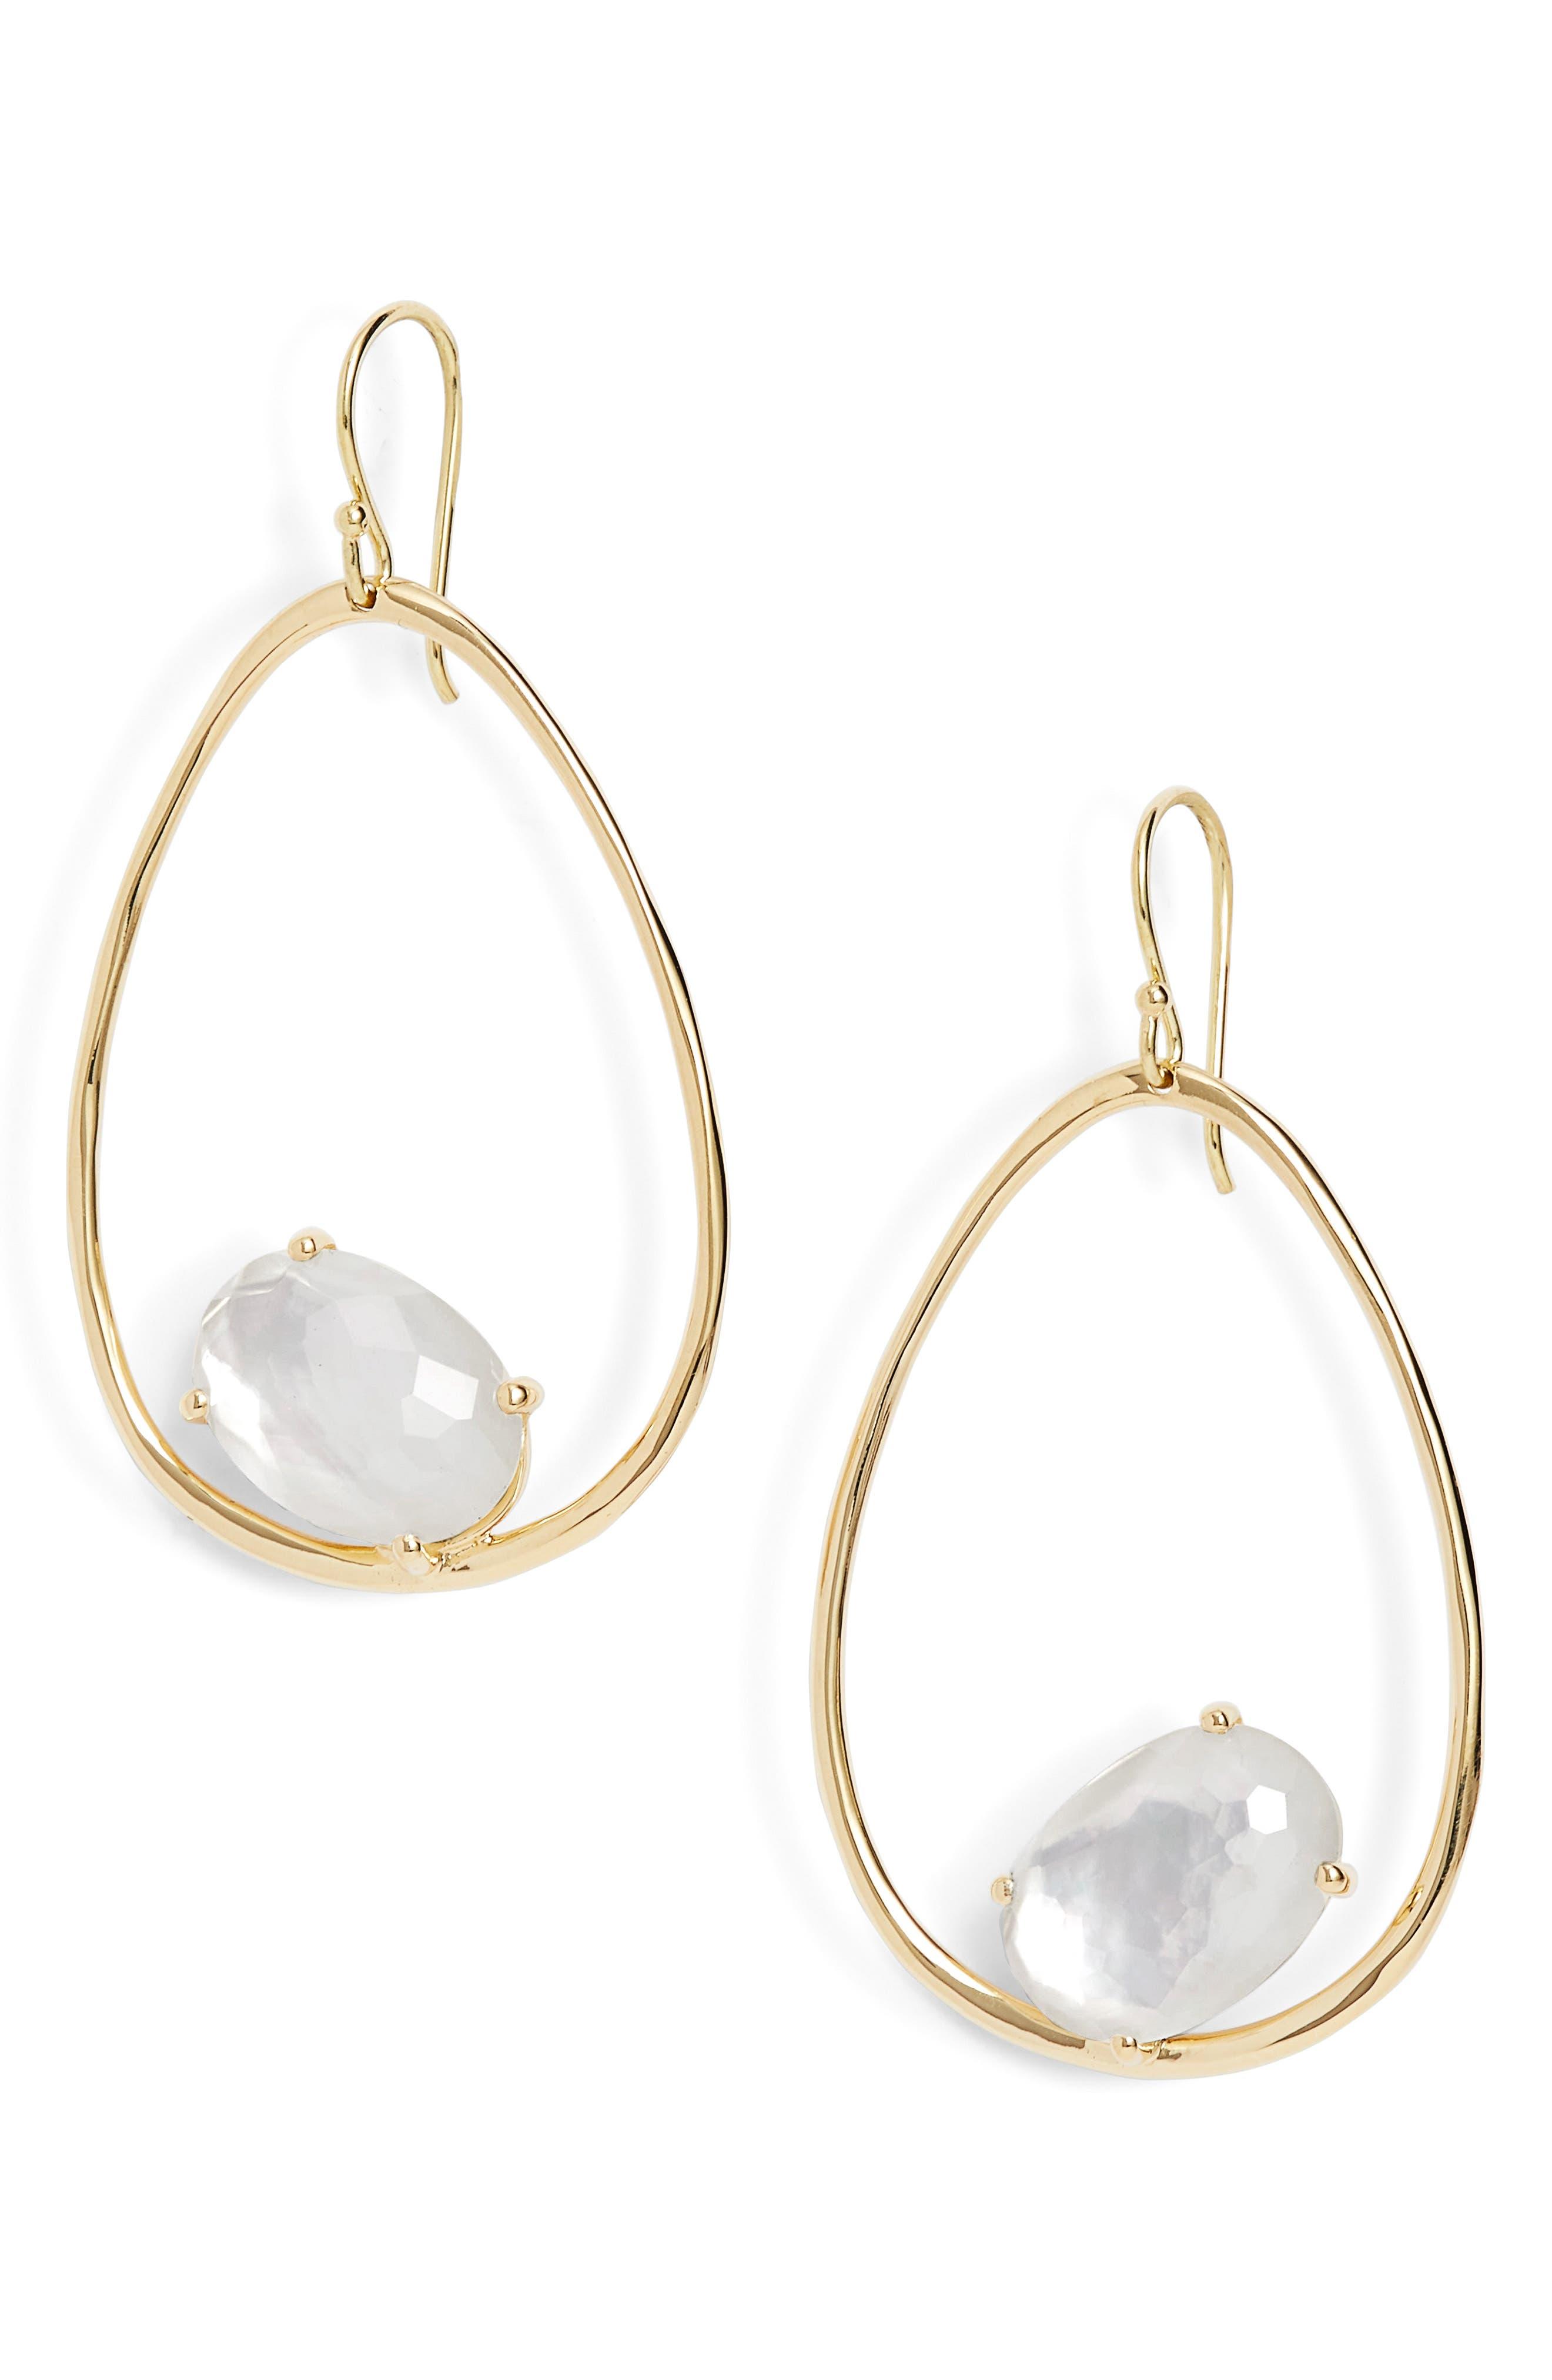 Image of Ippolita Rock Candy 18K Gold Large Drop Earrings